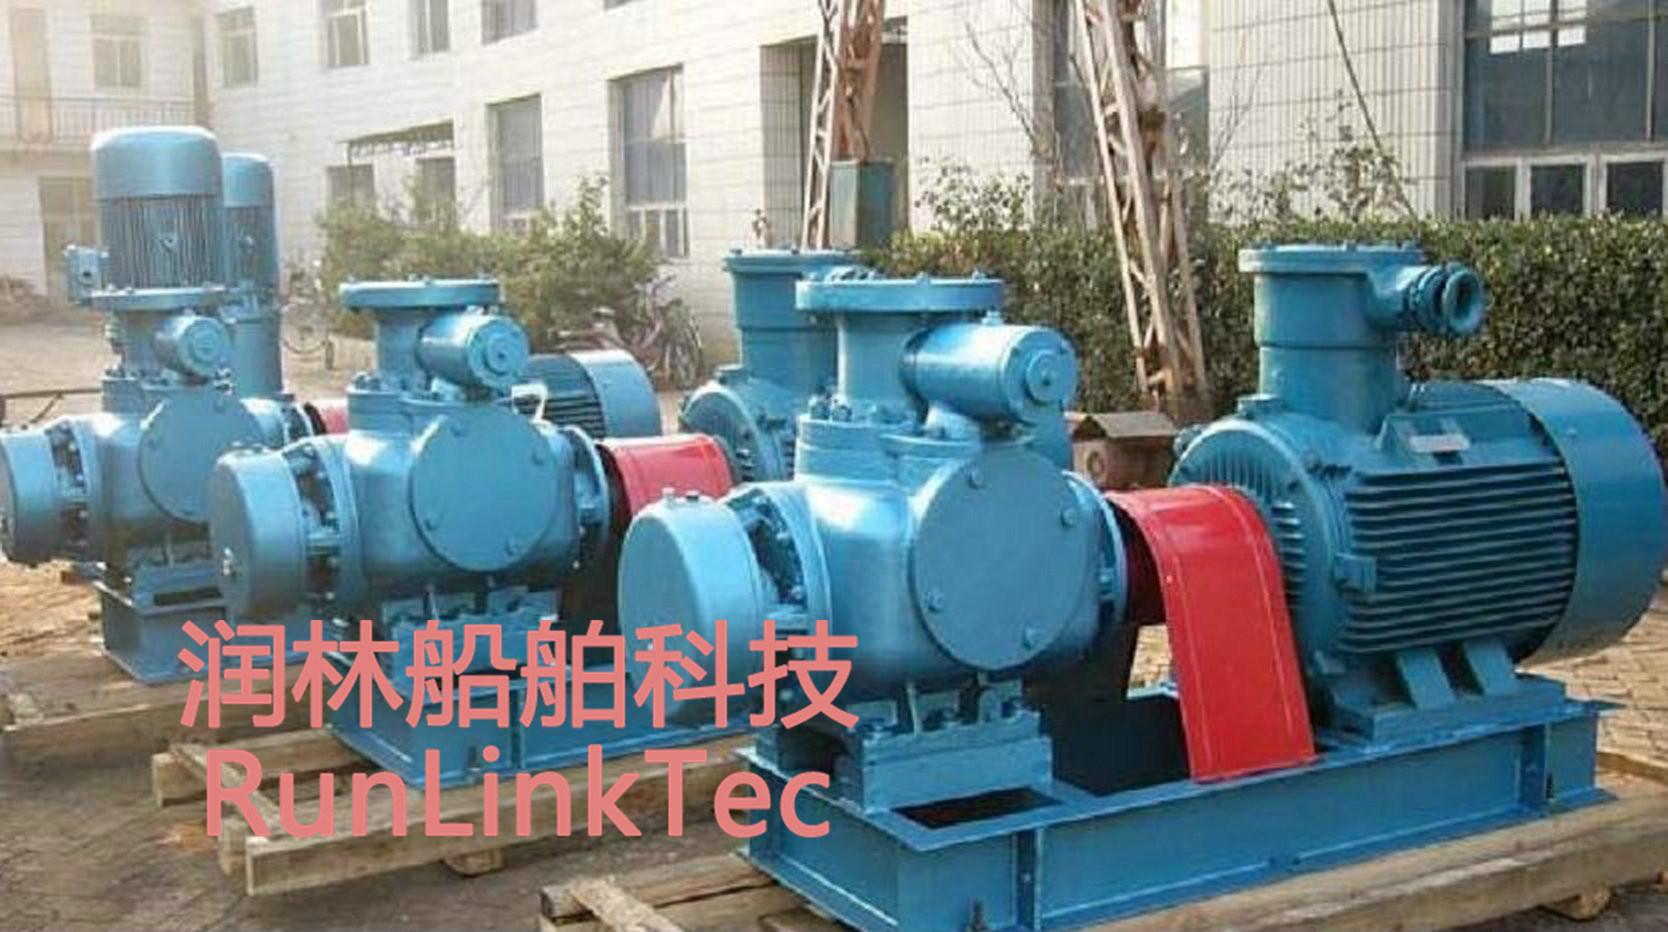 Stainless Screw Pump/Double Screw Pump/Twin Screw Pump/Fuel Oil Pump/2lb4-500-J/500m3/H